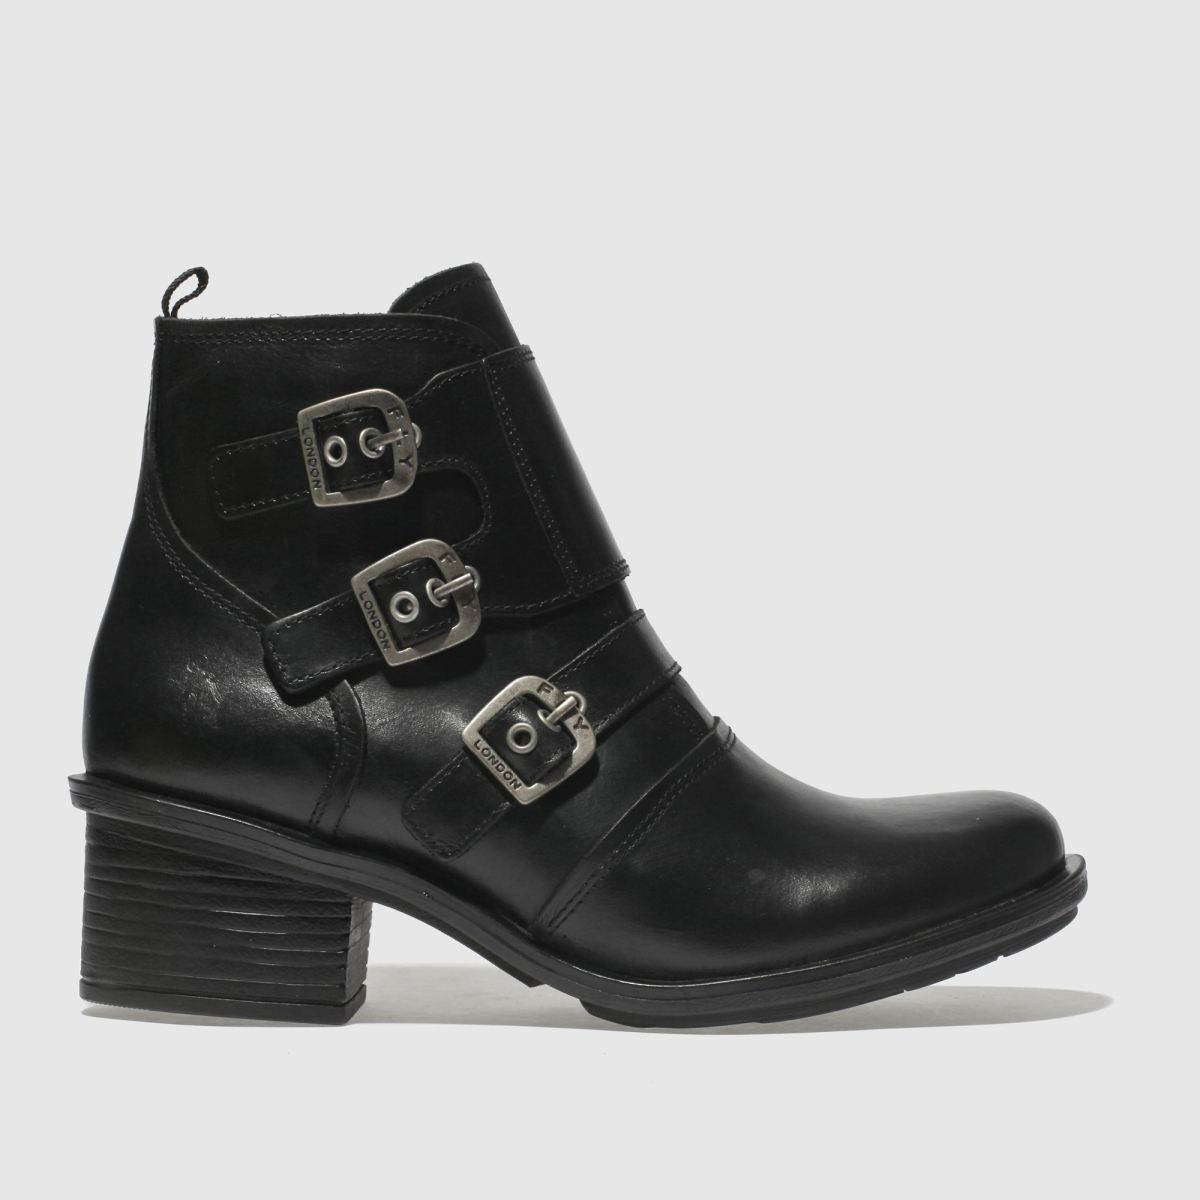 Fly London Black Crip Boots